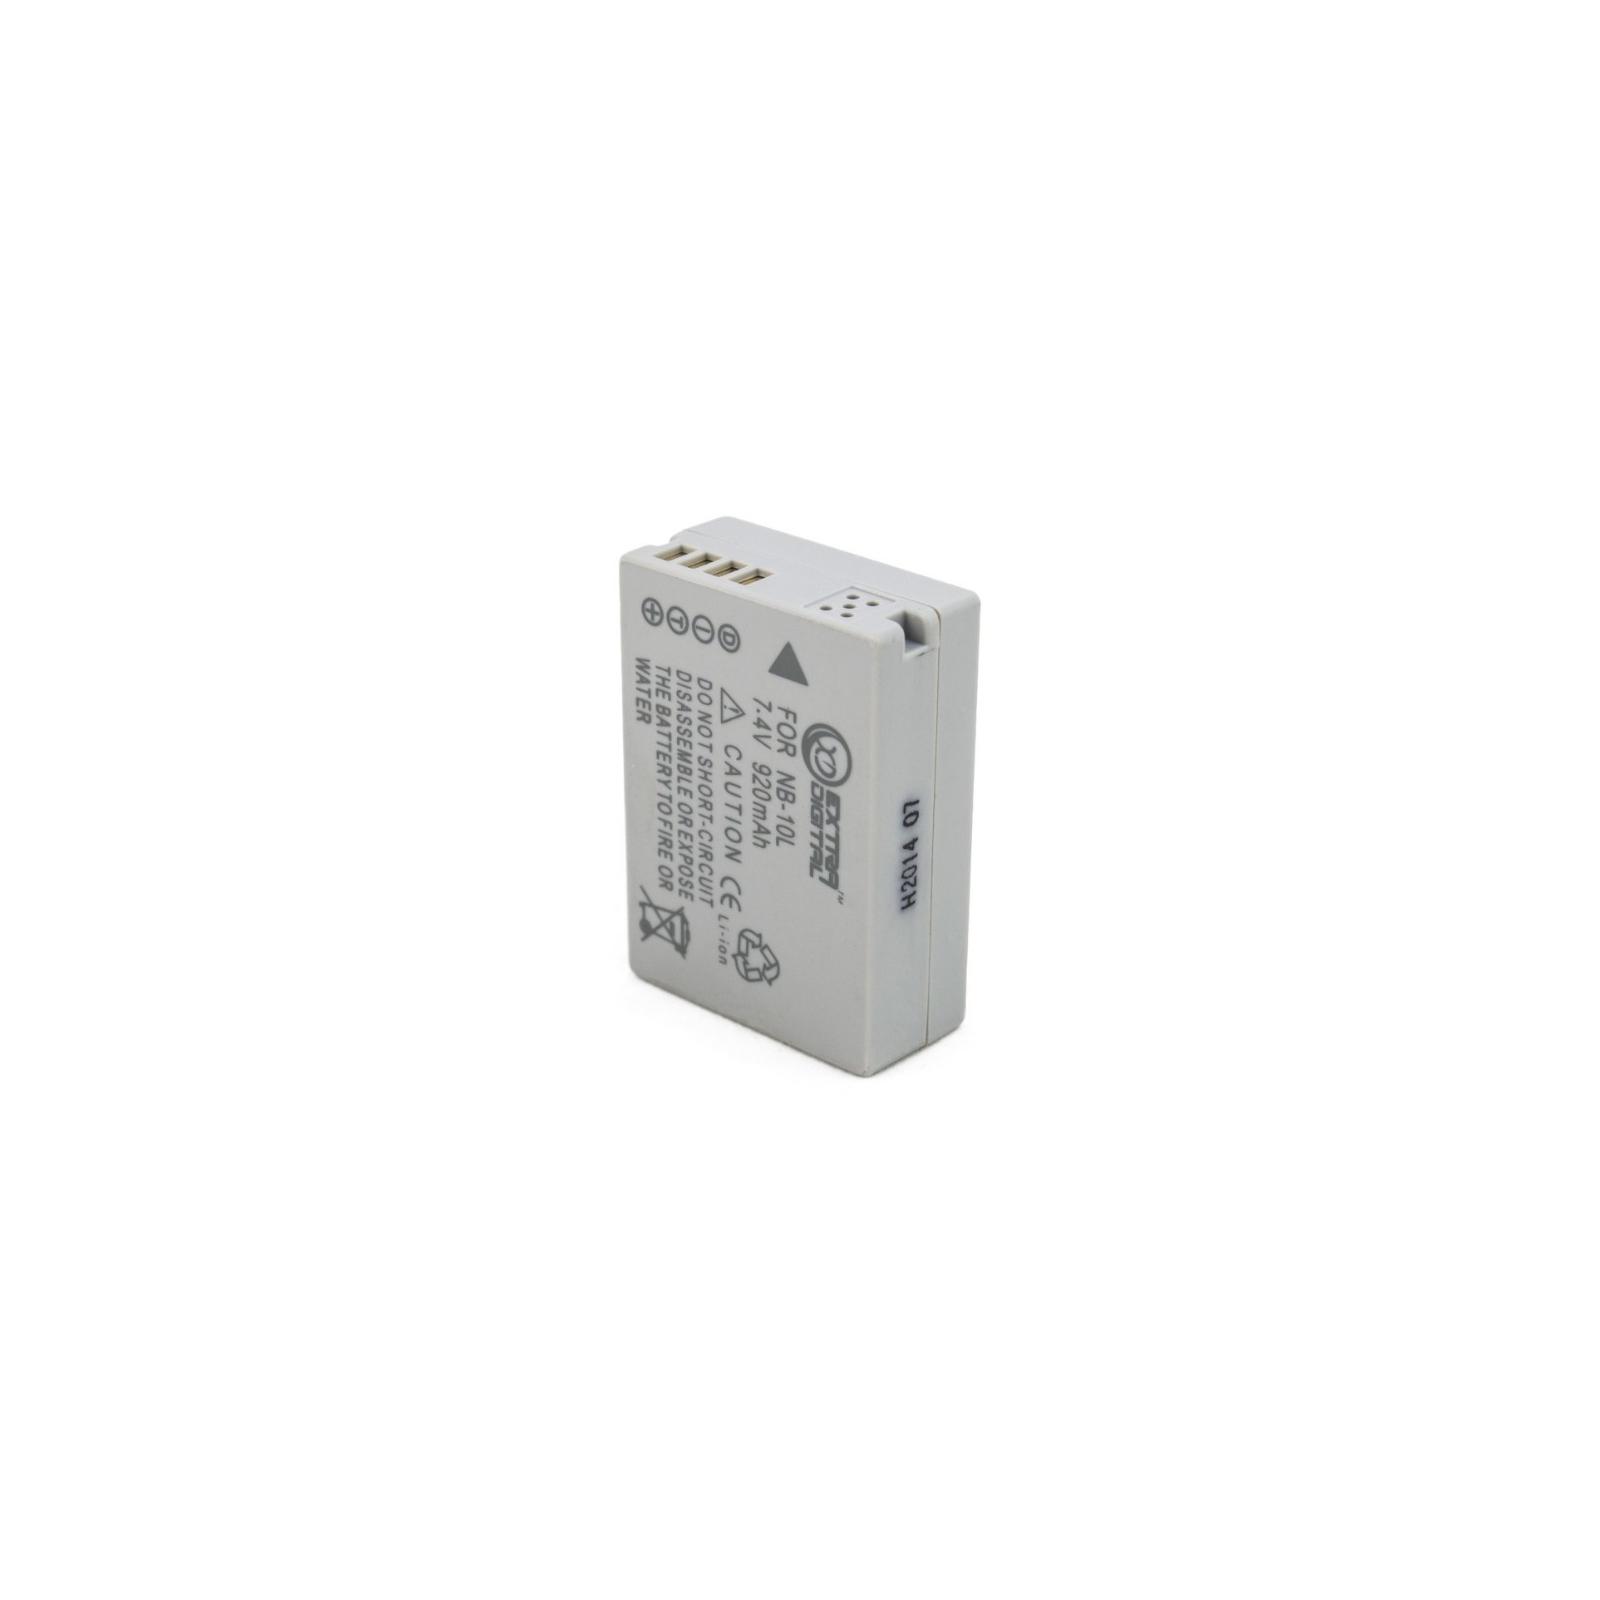 Аккумулятор к фото/видео EXTRADIGITAL Canon LP-E5 (BDC2430) изображение 3